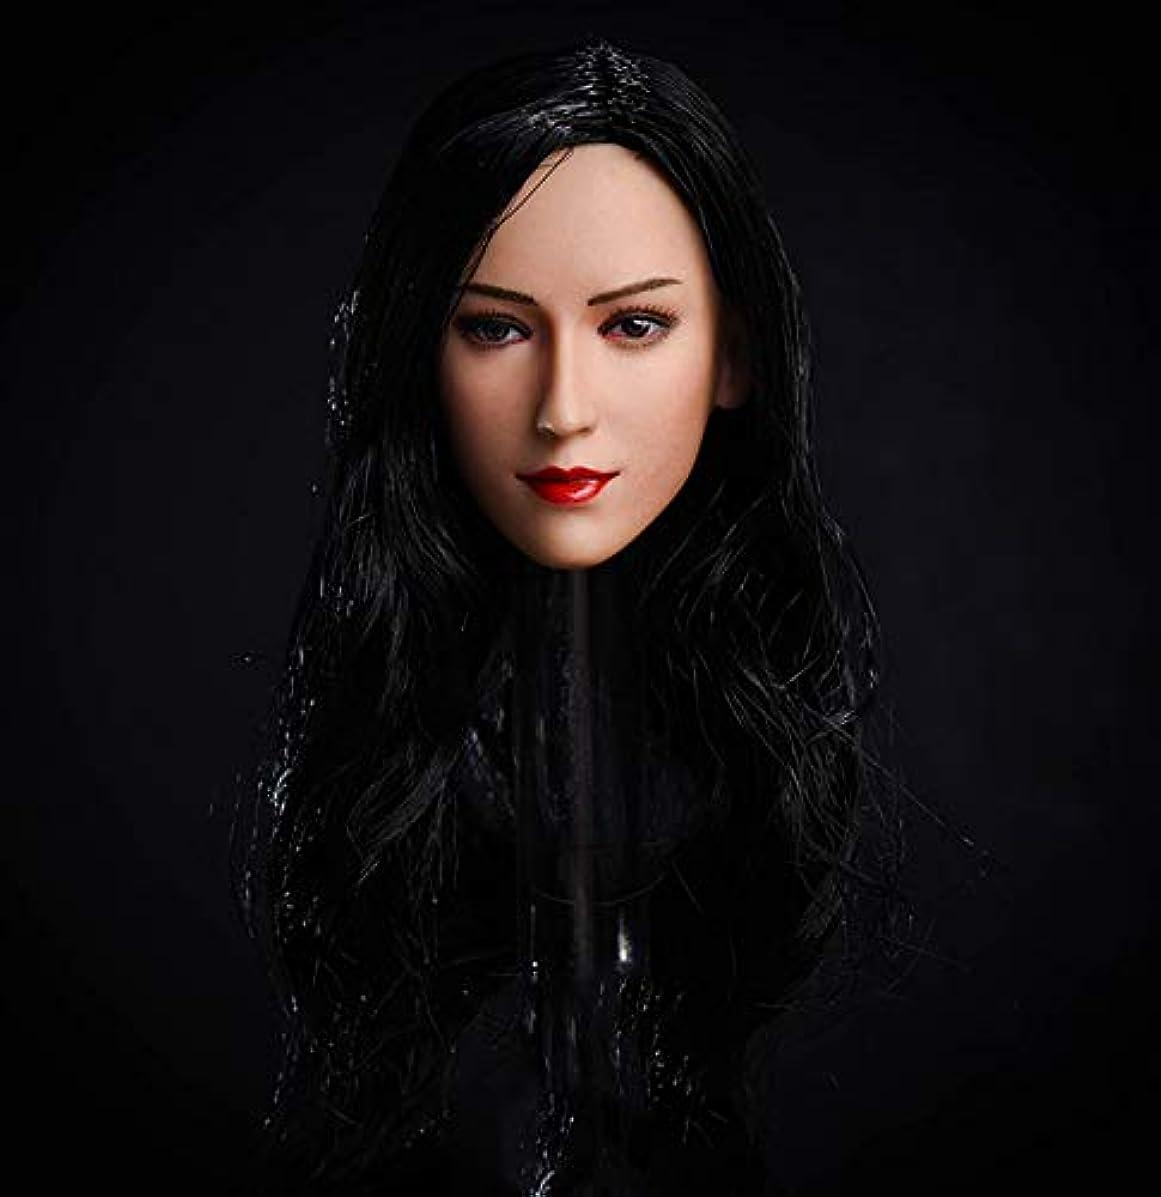 HiPlay 1/6 Scale Female Figure Head Sculpt, Beauty Charming Girl Doll Head for 12